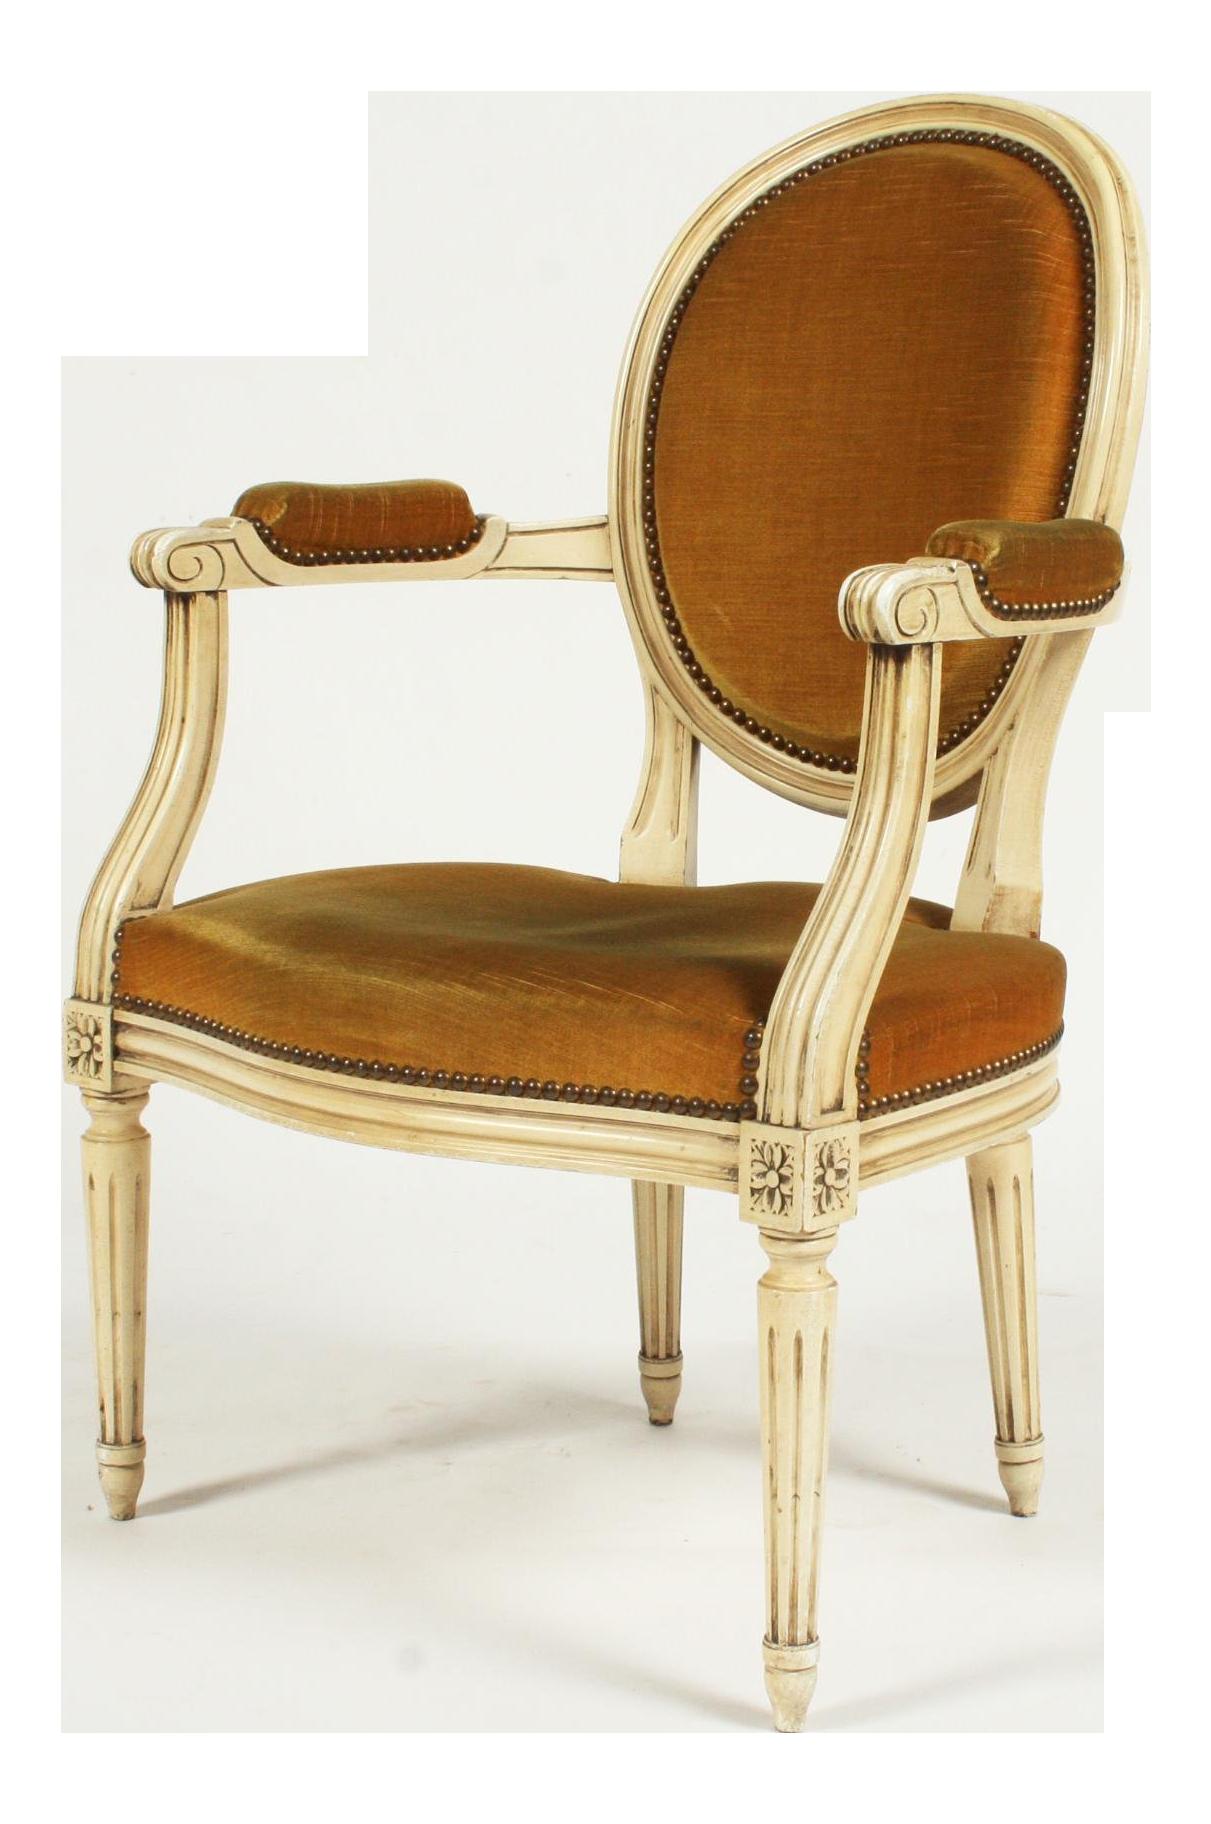 Vintage Louis XVI Style Armchair